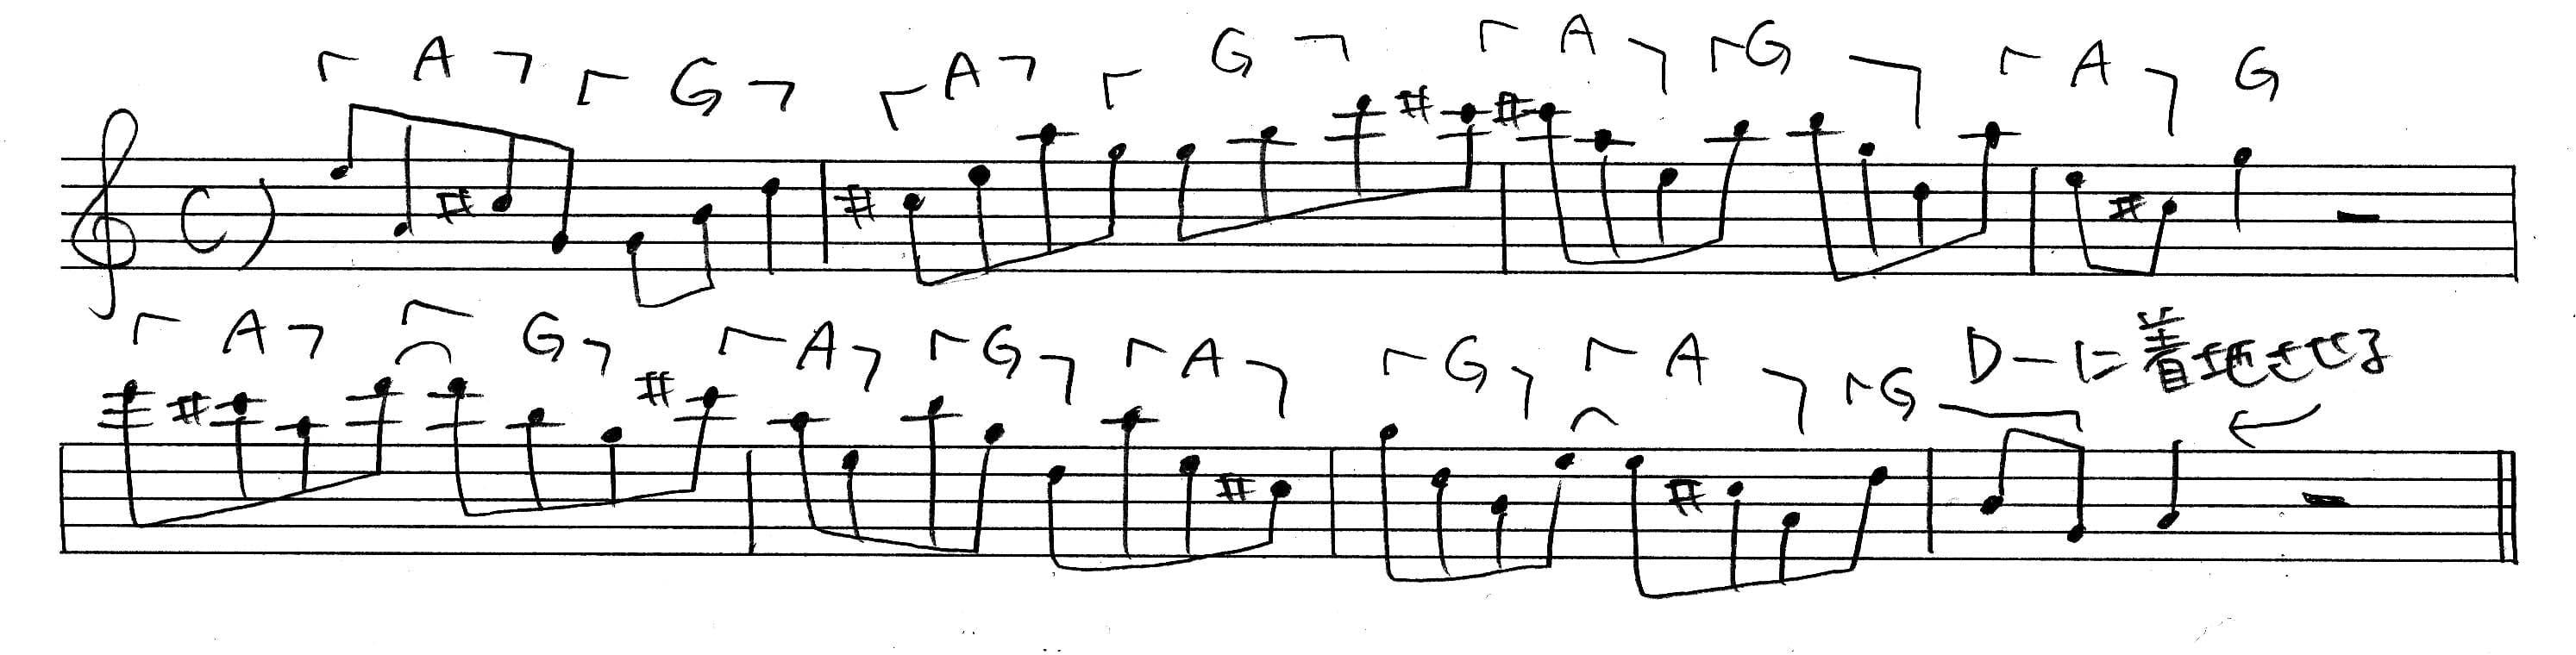 a7-triad